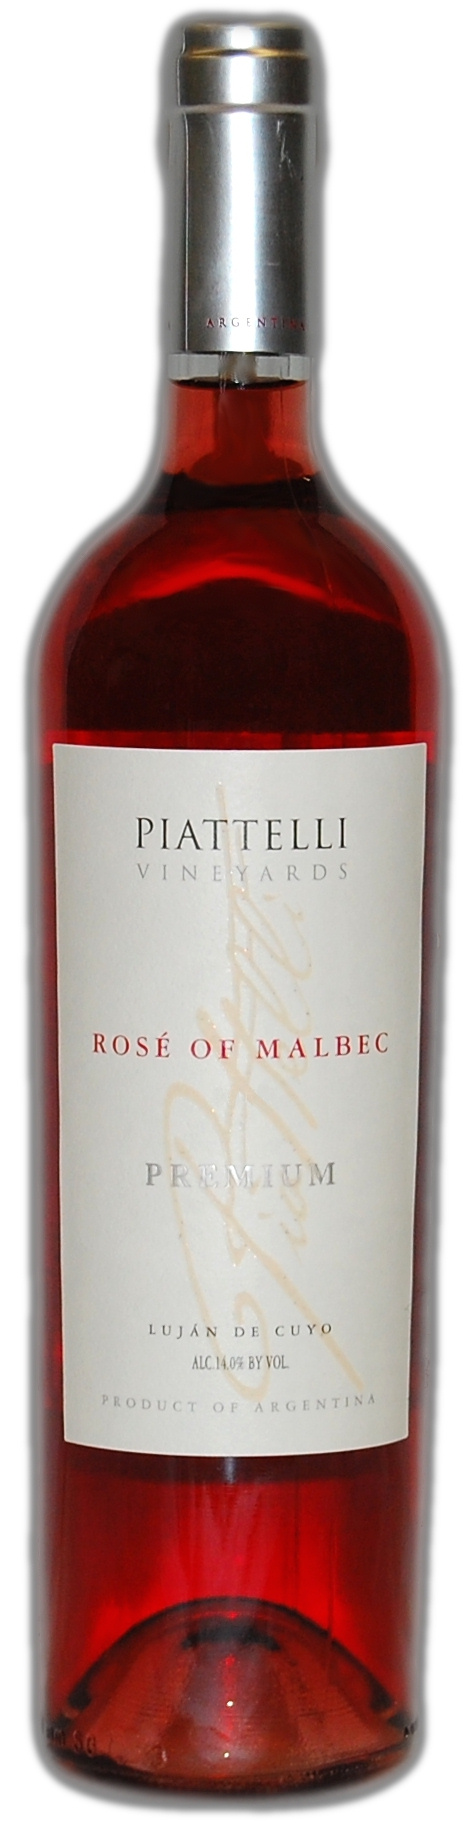 Piattelli Premium Reserve Rose Roseofmalbec Rose Wine Bottle Wine Bottle Malbec